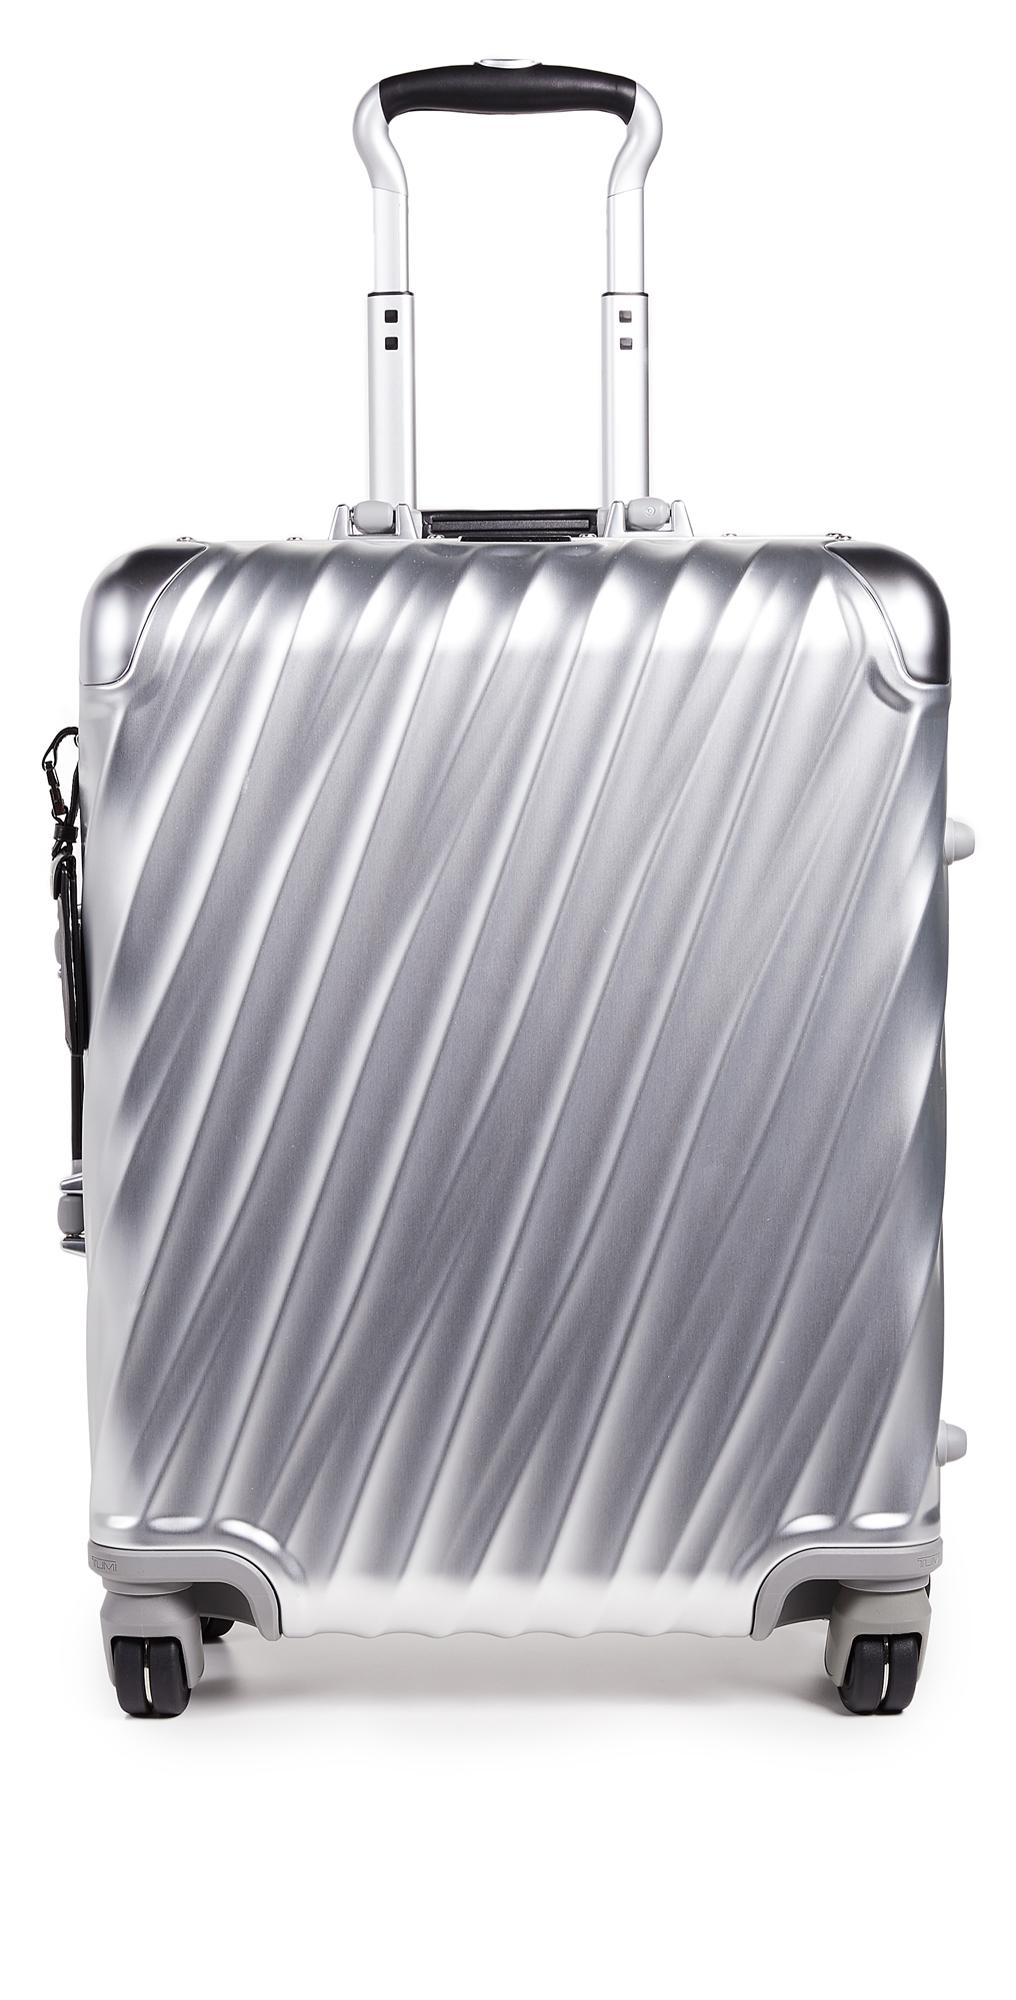 Tumi 19 Degree Aluminum Continental Carry On Suitcase